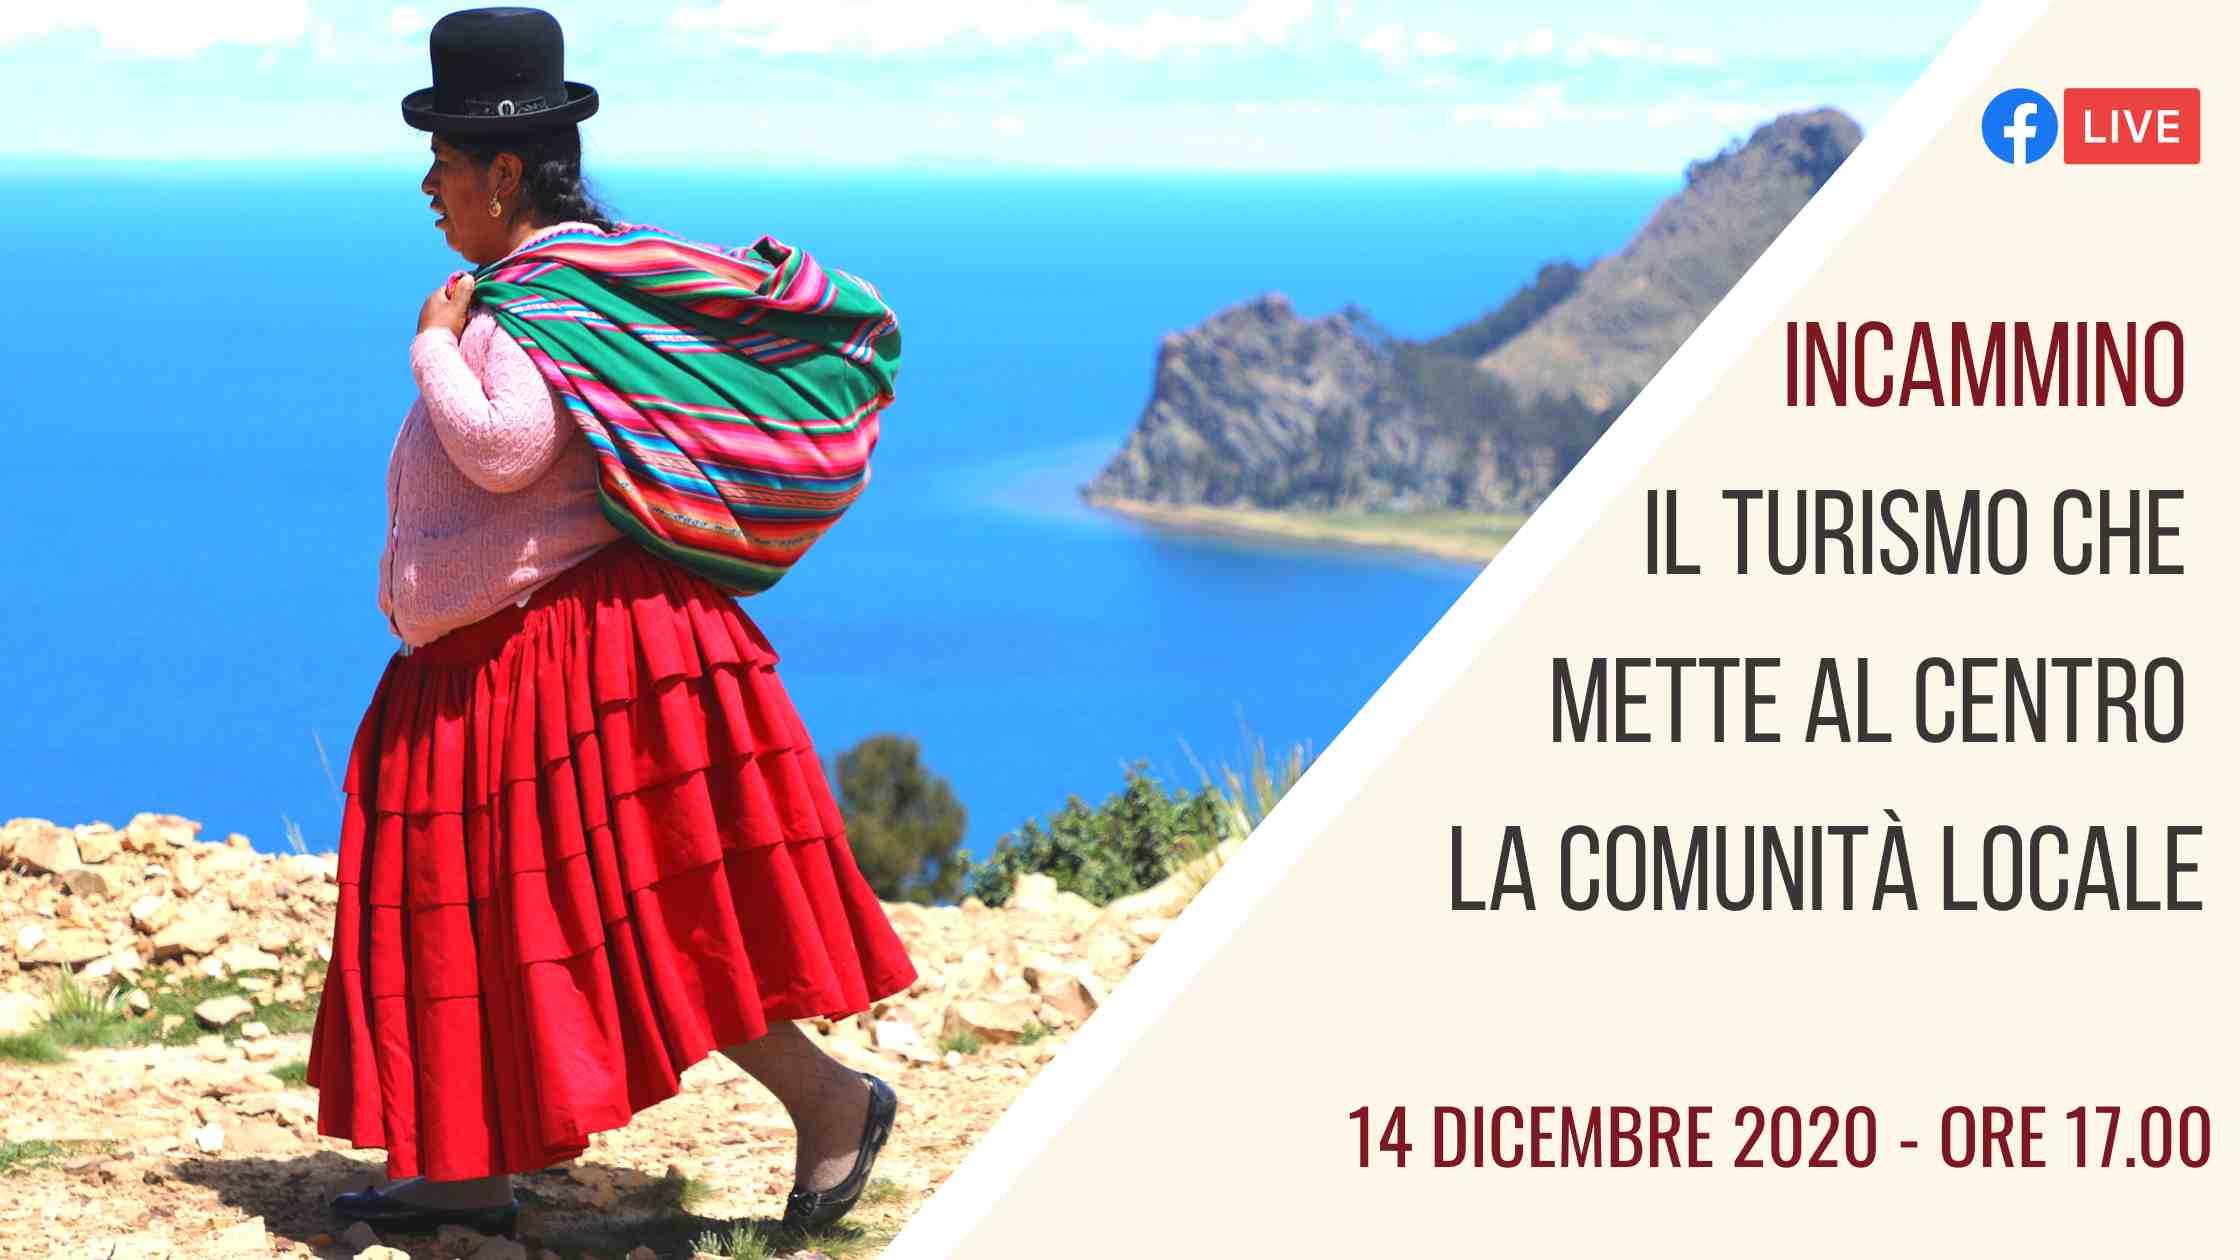 Incammino turismo Bolivia ICEI